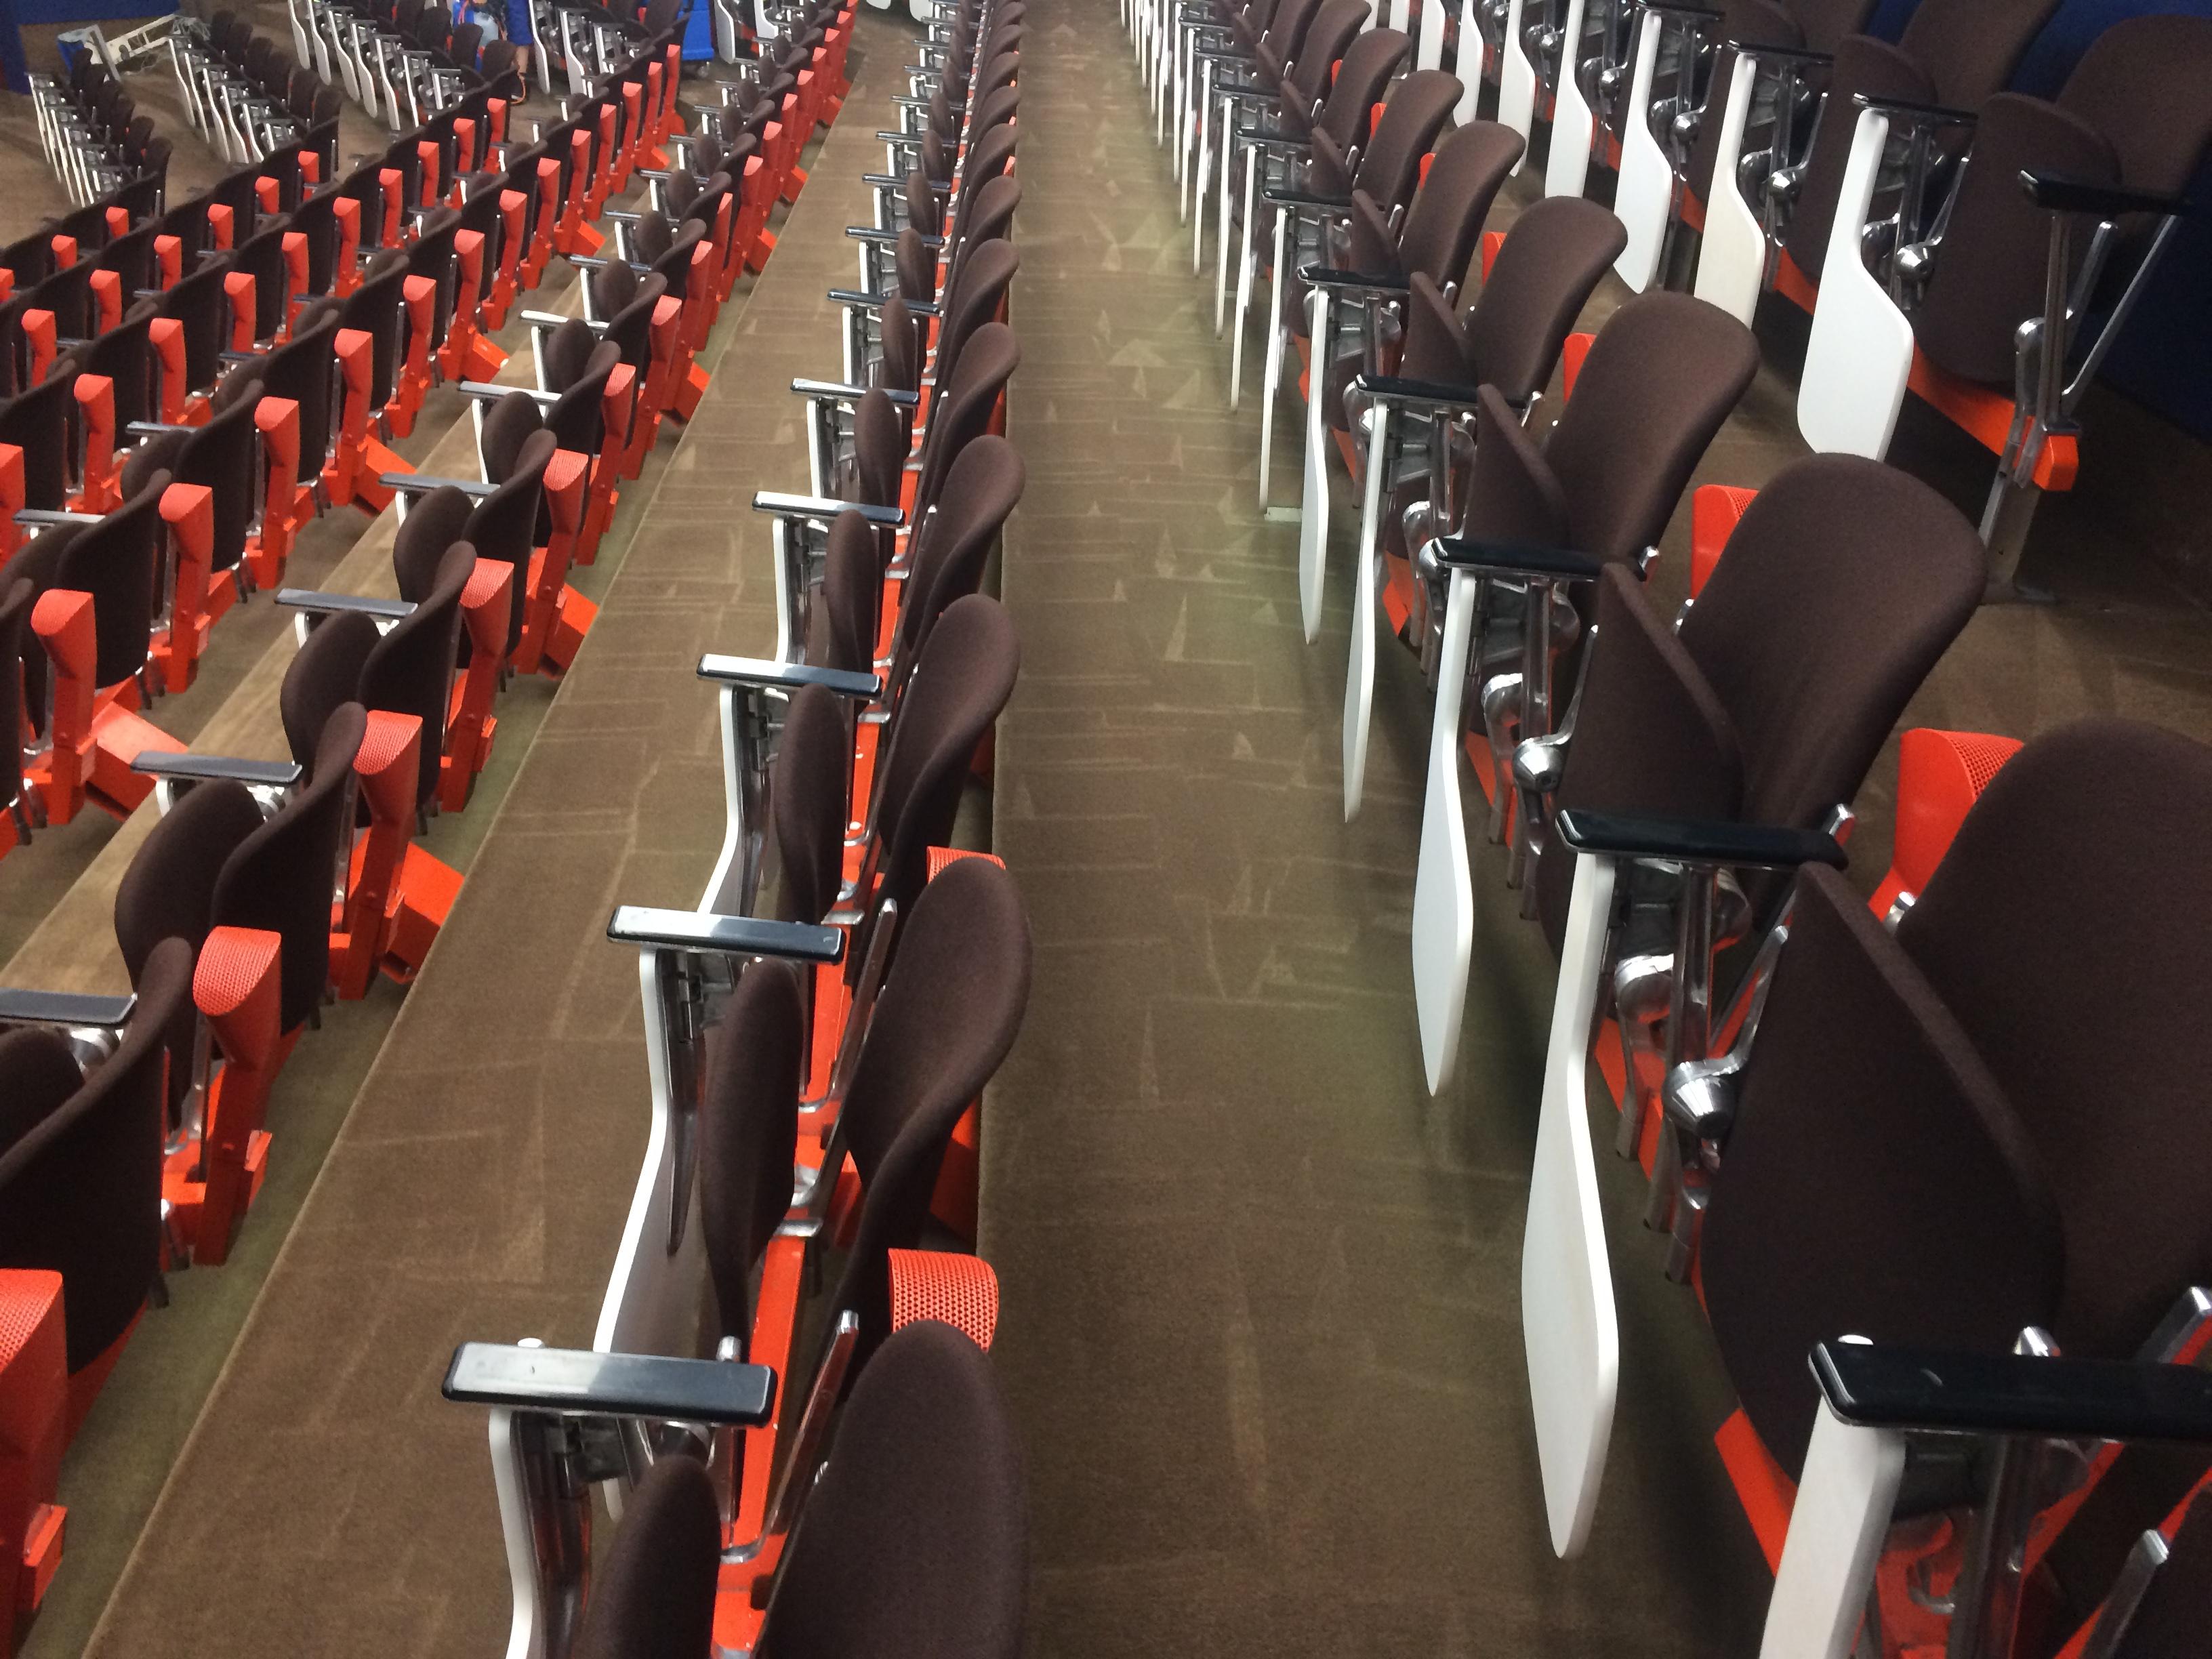 HUCKA Reinigung Stühle mit Gestell MPI Hörsaal (4)